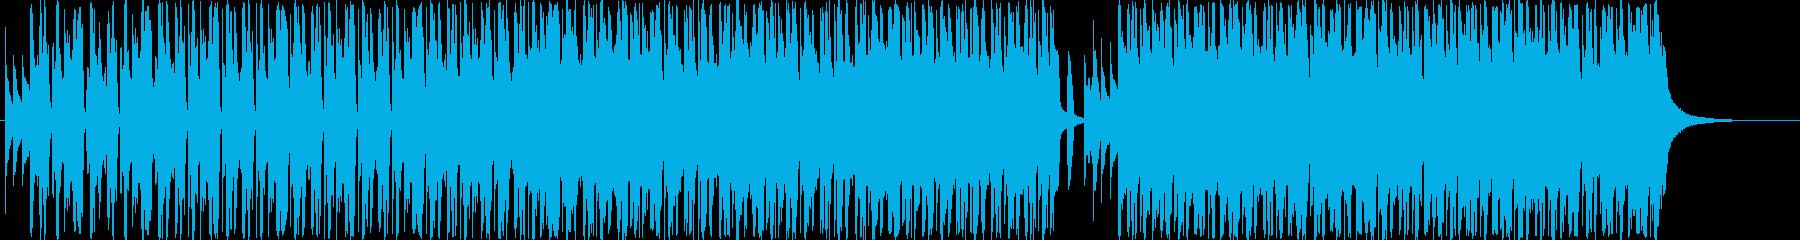 Puzzle Makerの再生済みの波形